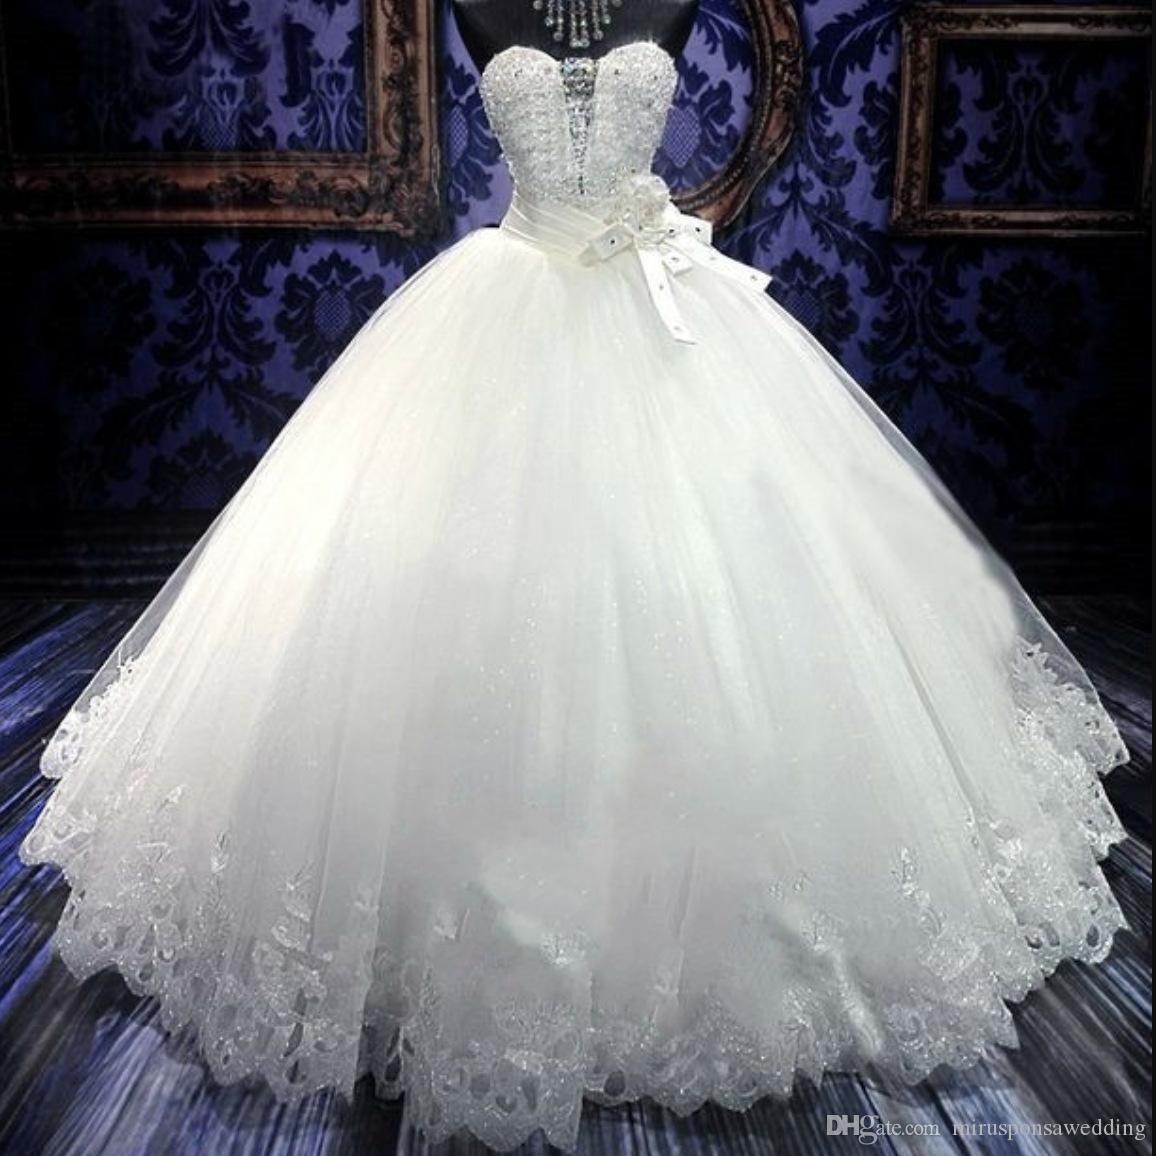 Cinderella Wedding Dress Off 71 Latest Trends